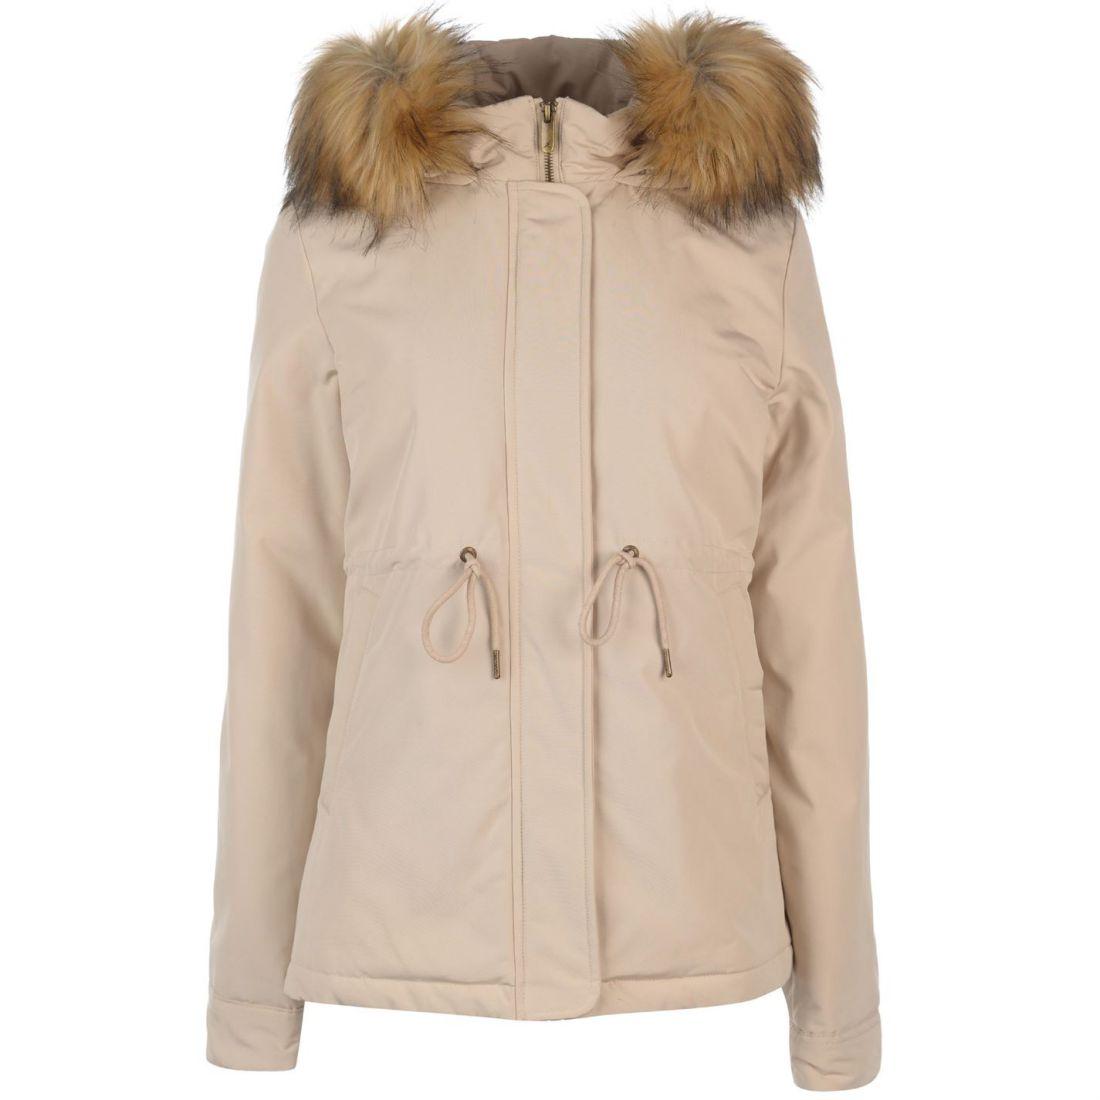 Kangol Womens Pintuck Parka Jacket Coat Top Long Sleeve Hooded Zip Full Fur  Trim 5b961fab285c